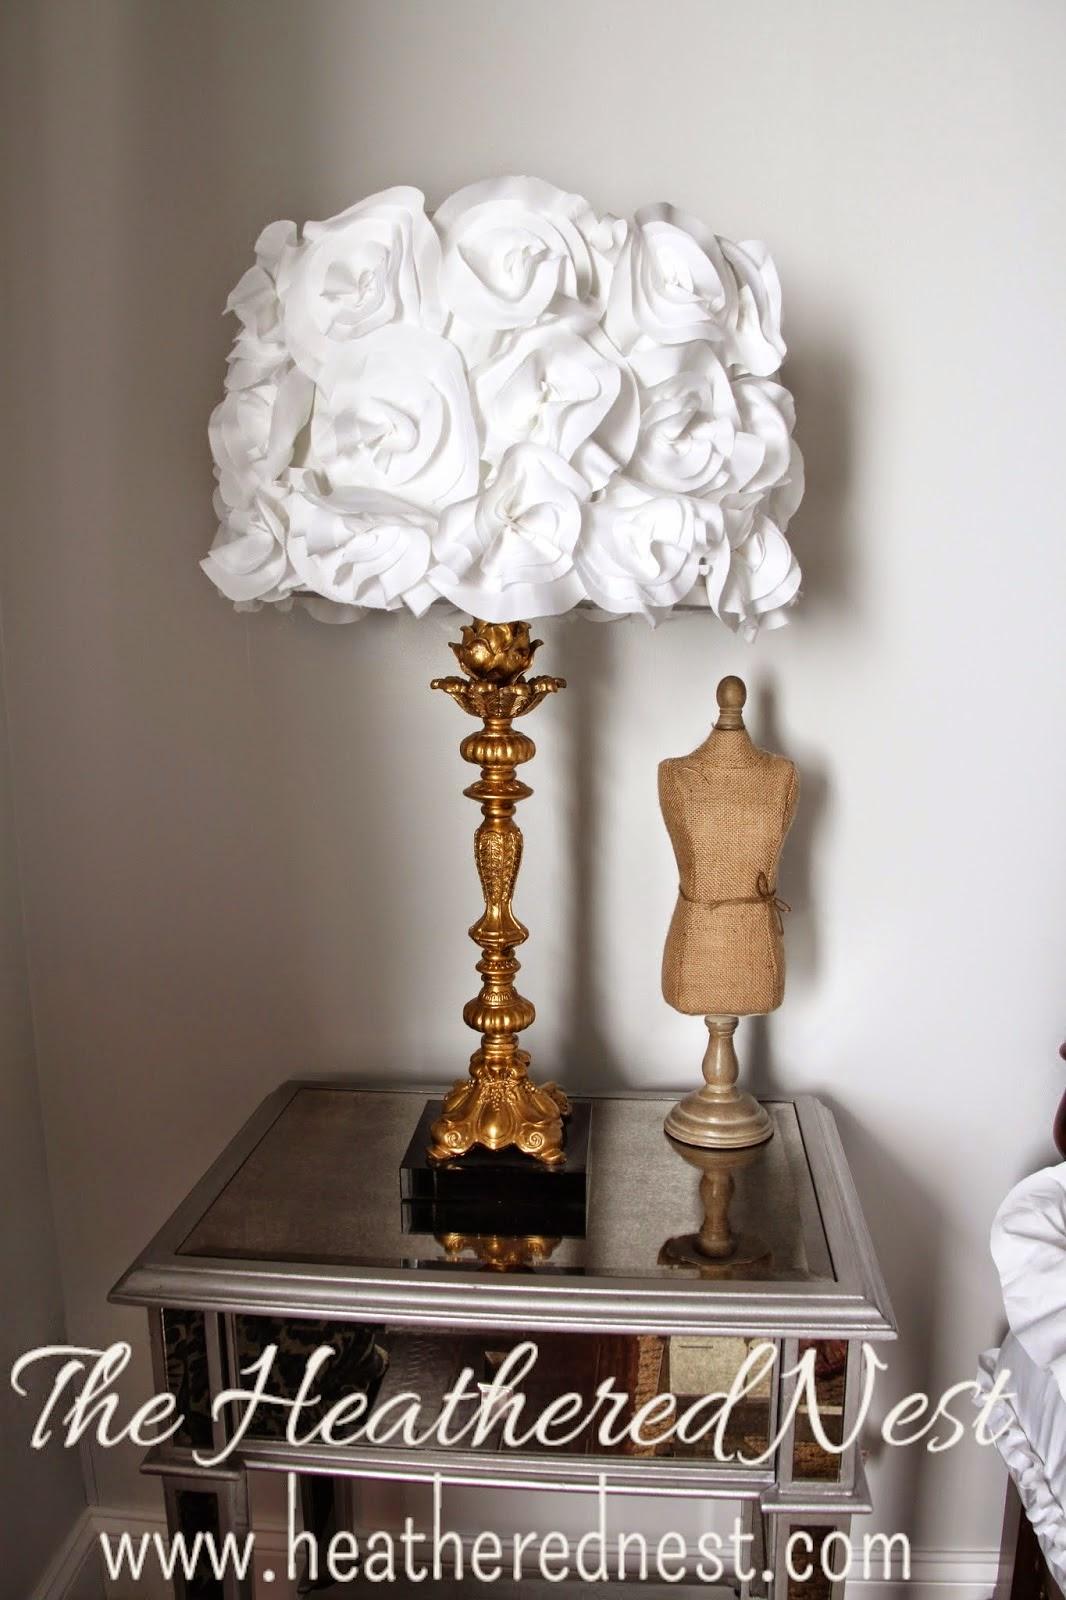 Goodwill Tips: DIY Lampshade Ideas